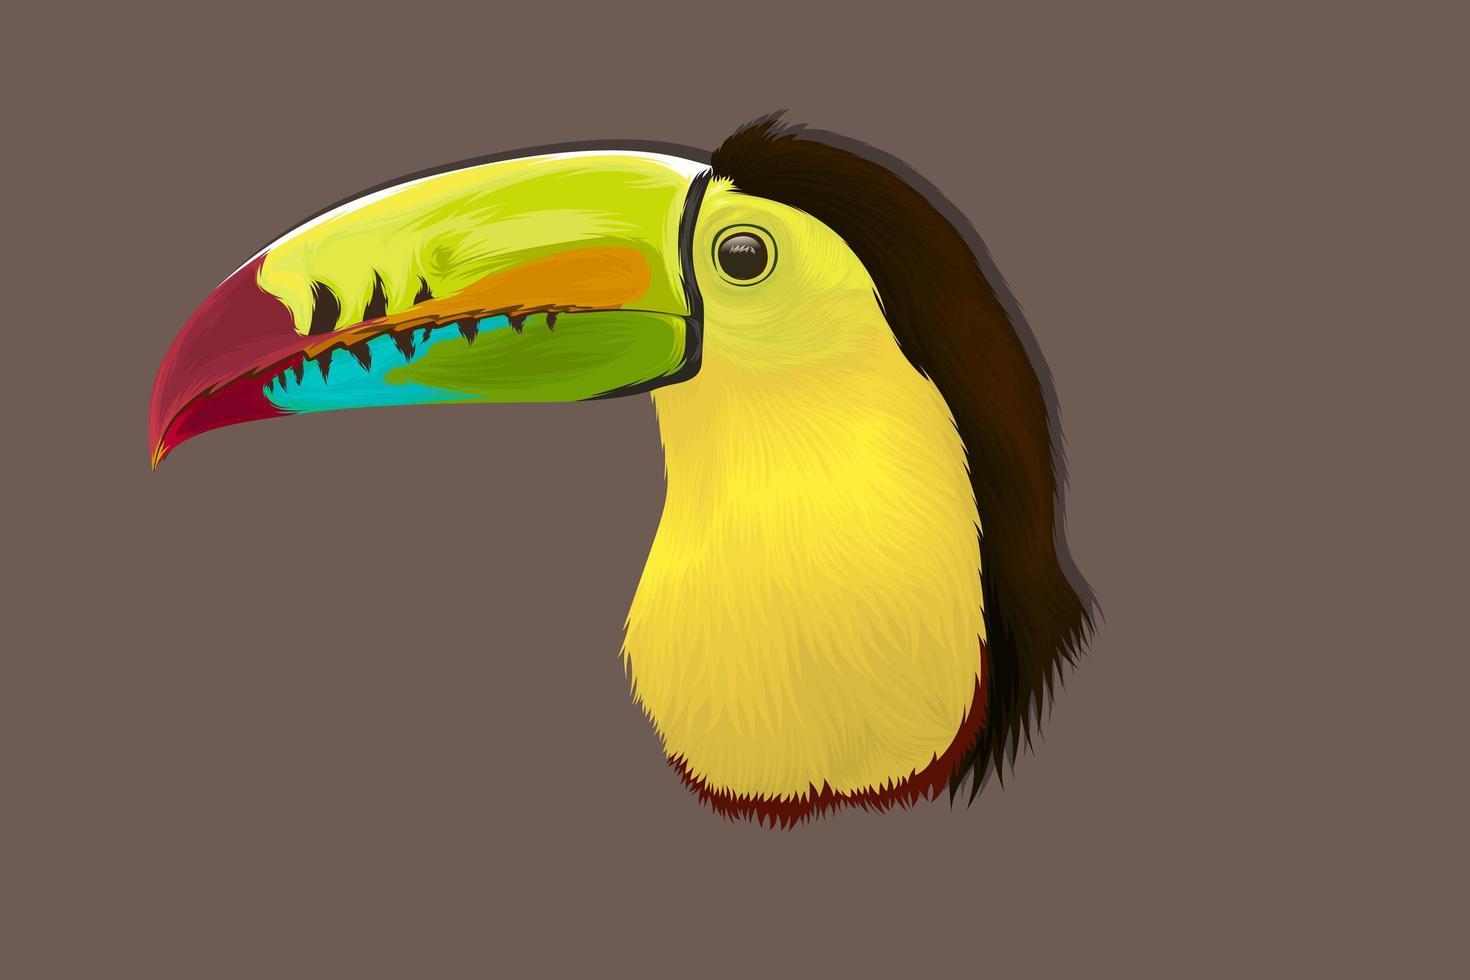 tropisk fågel realistisk handritning vektor